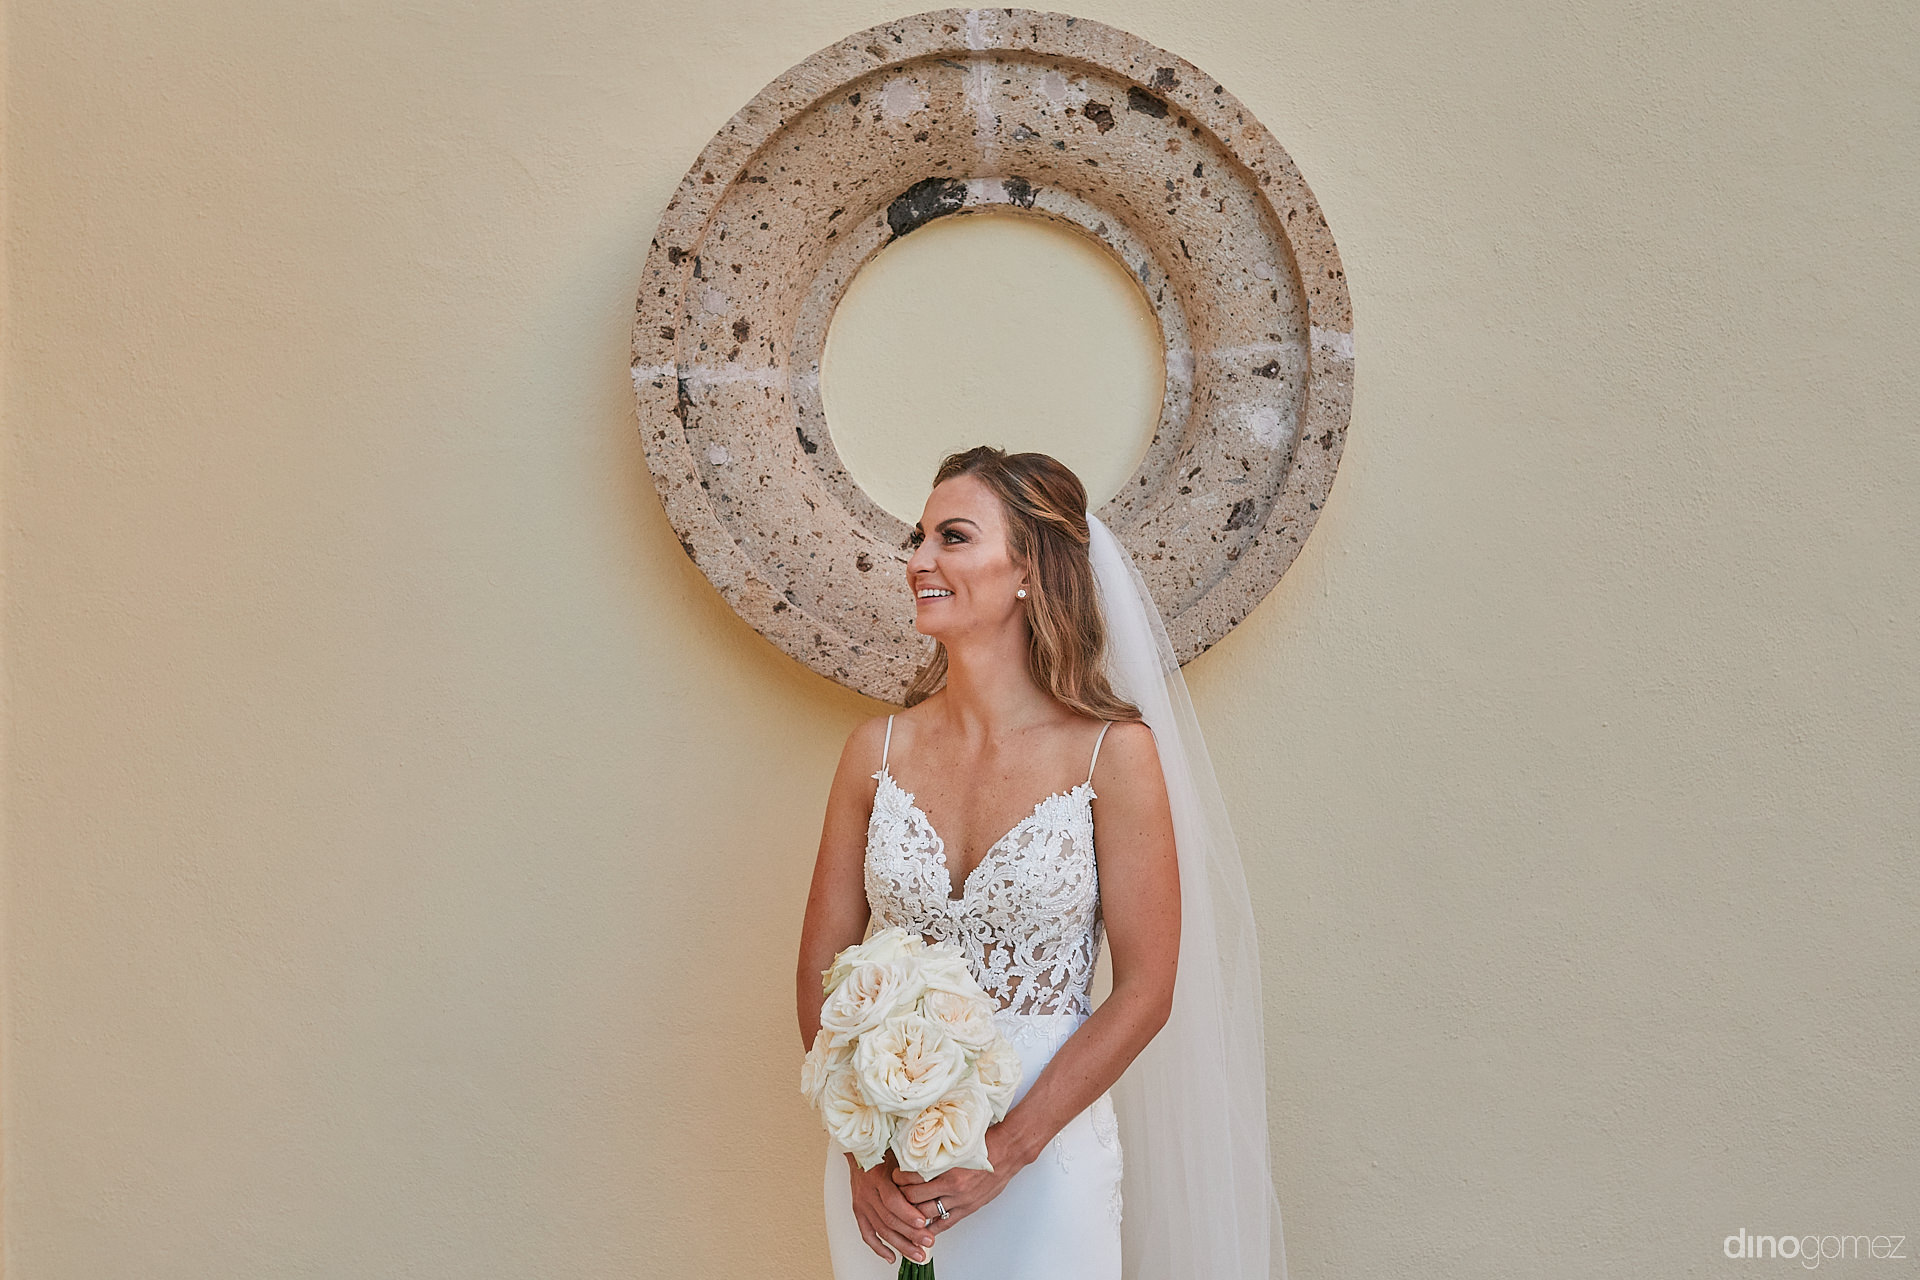 Los Cabos Wedding Vendors - Luxury Wedding Photographer In Cabo Dino Gomez - C&T